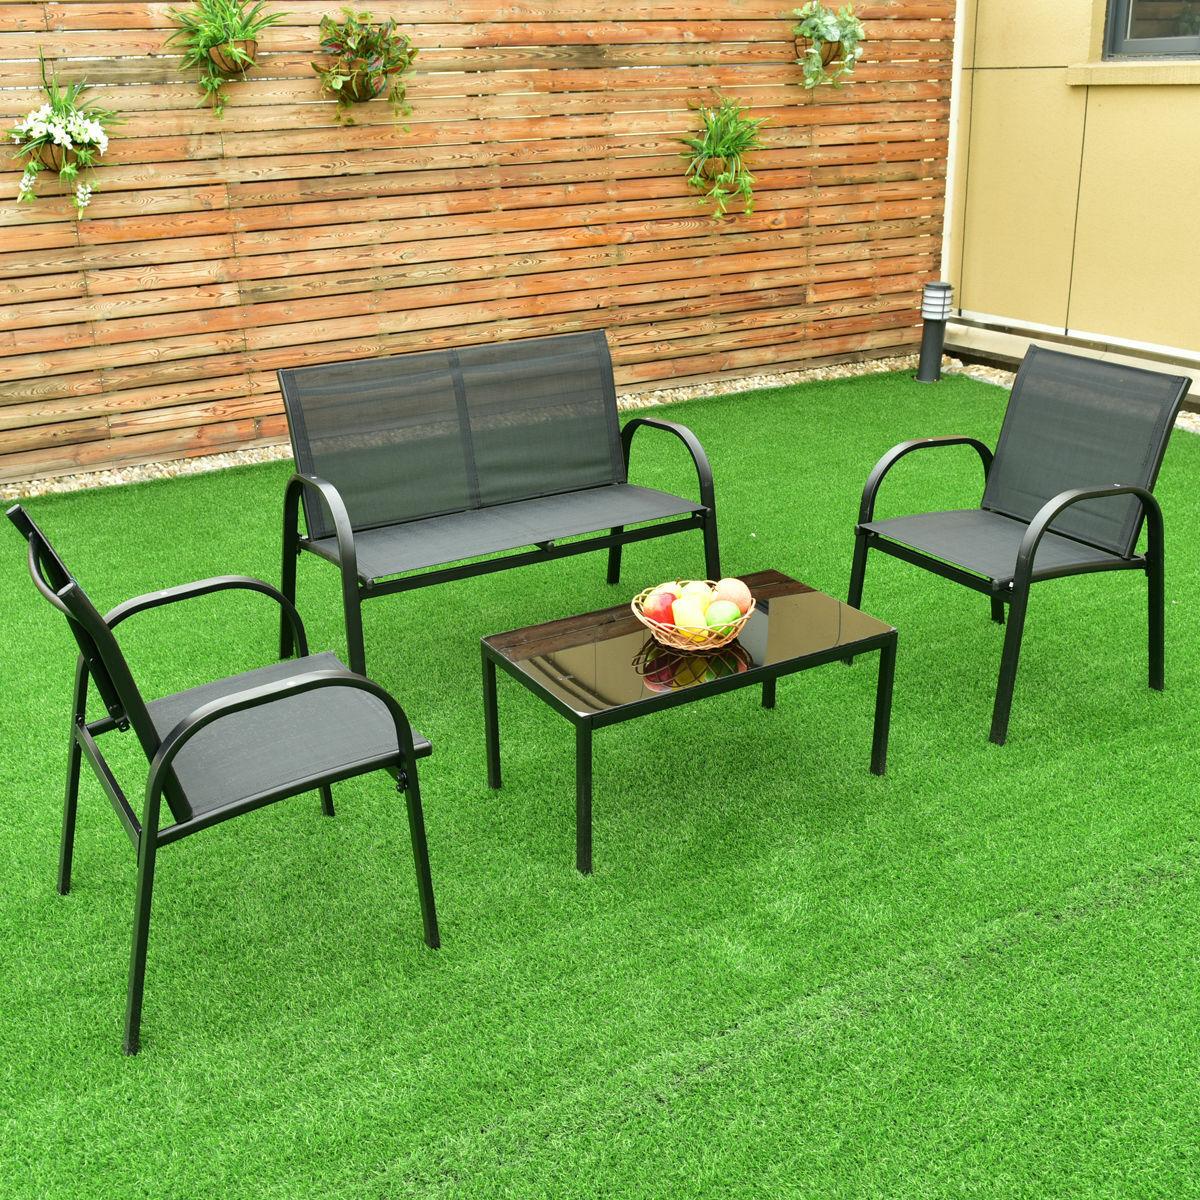 Garden Furniture - New 4 PCS Patio Furniture Set Sofa Coffee Table Steel Frame Garden Deck Black